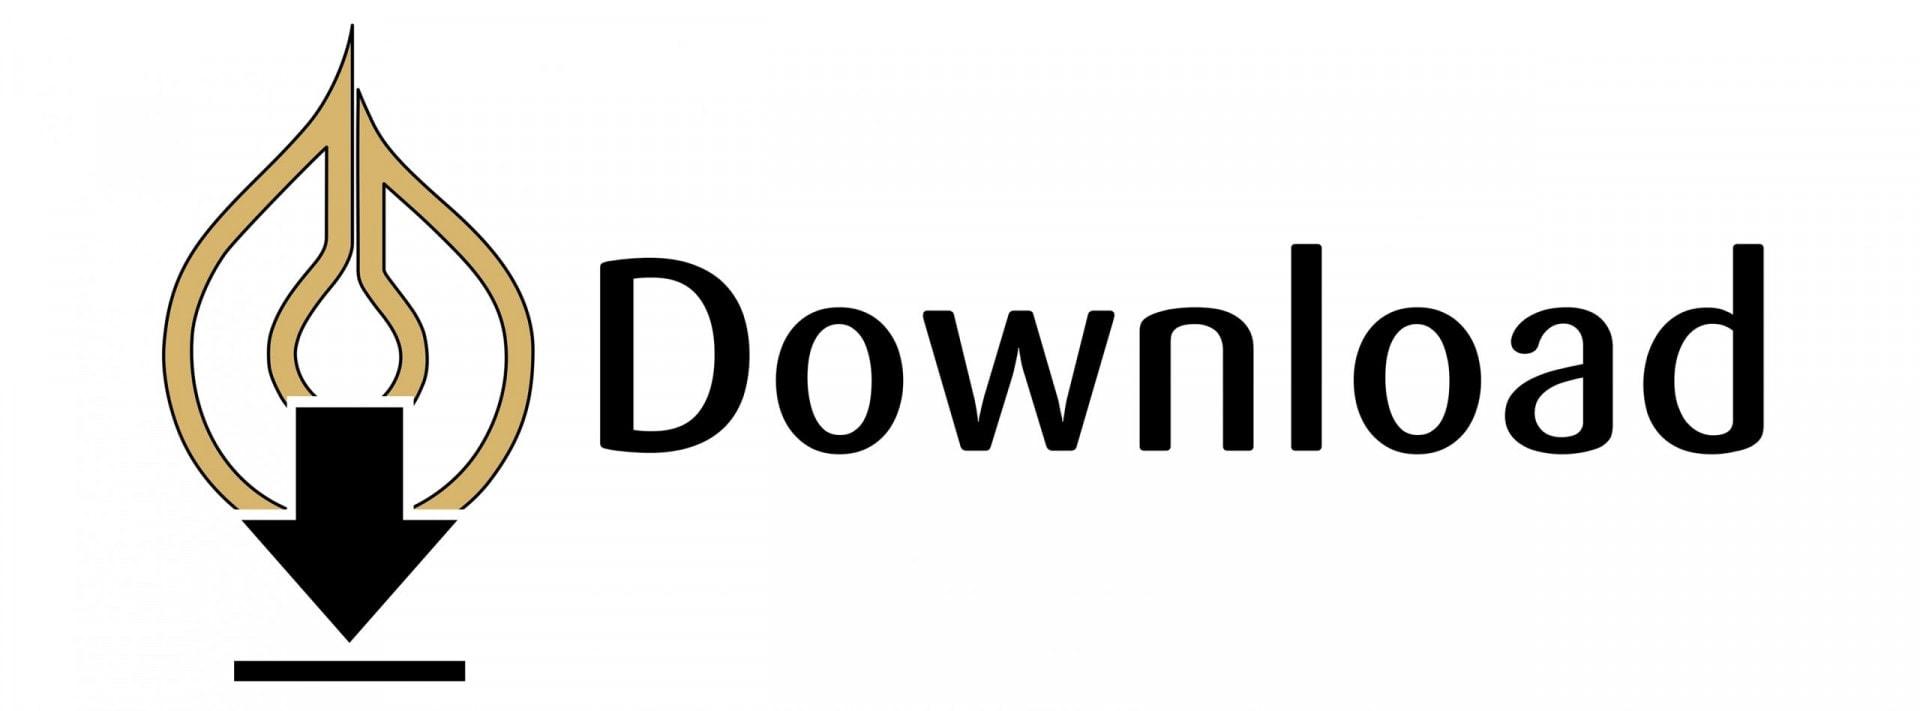 Öltropfen Download scaled